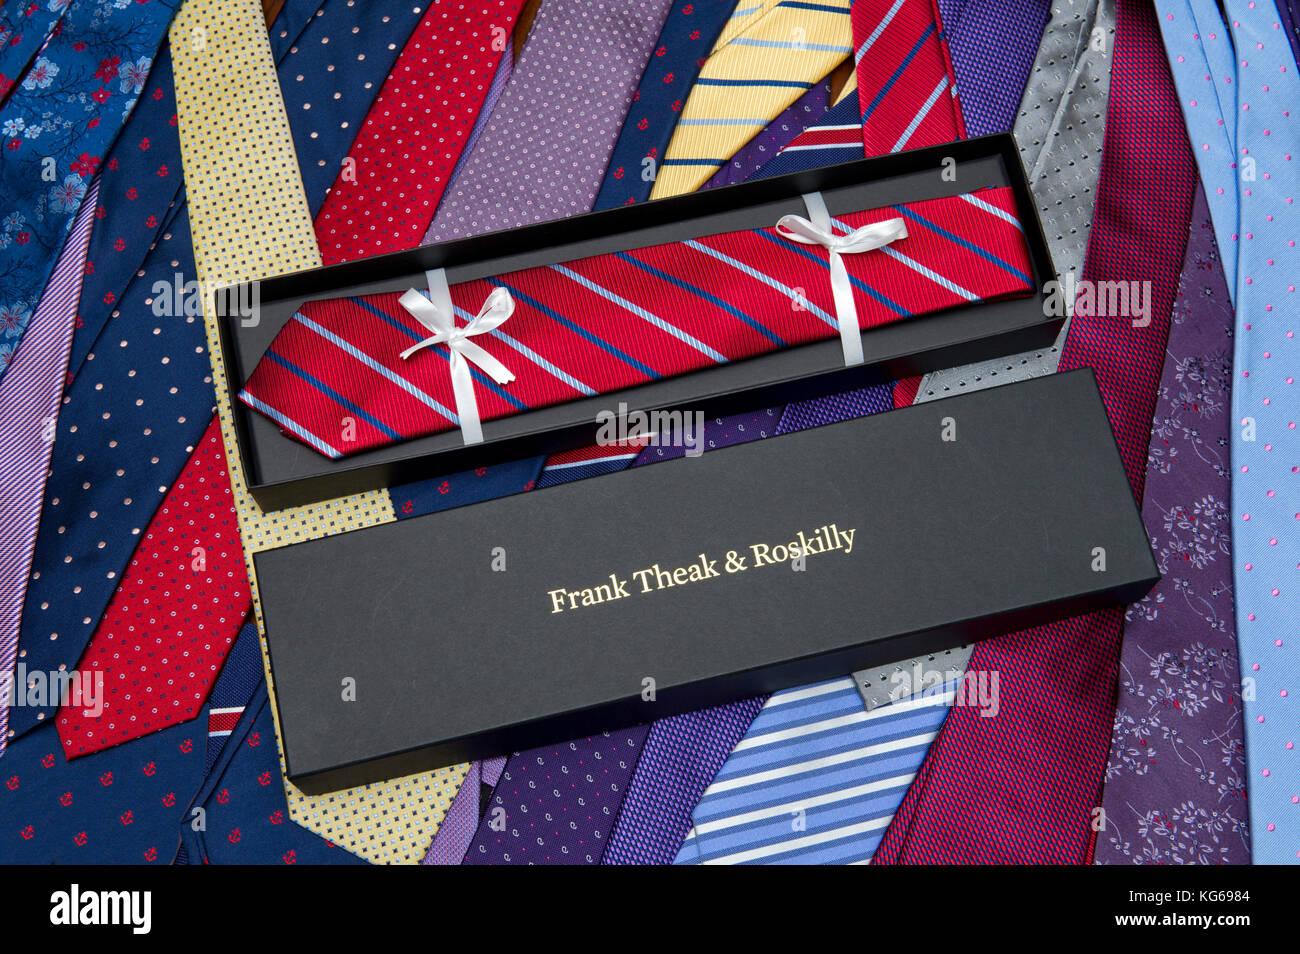 Frank Theak & Roskilly tie company, with owners John & Carol Mott. - Stock Image